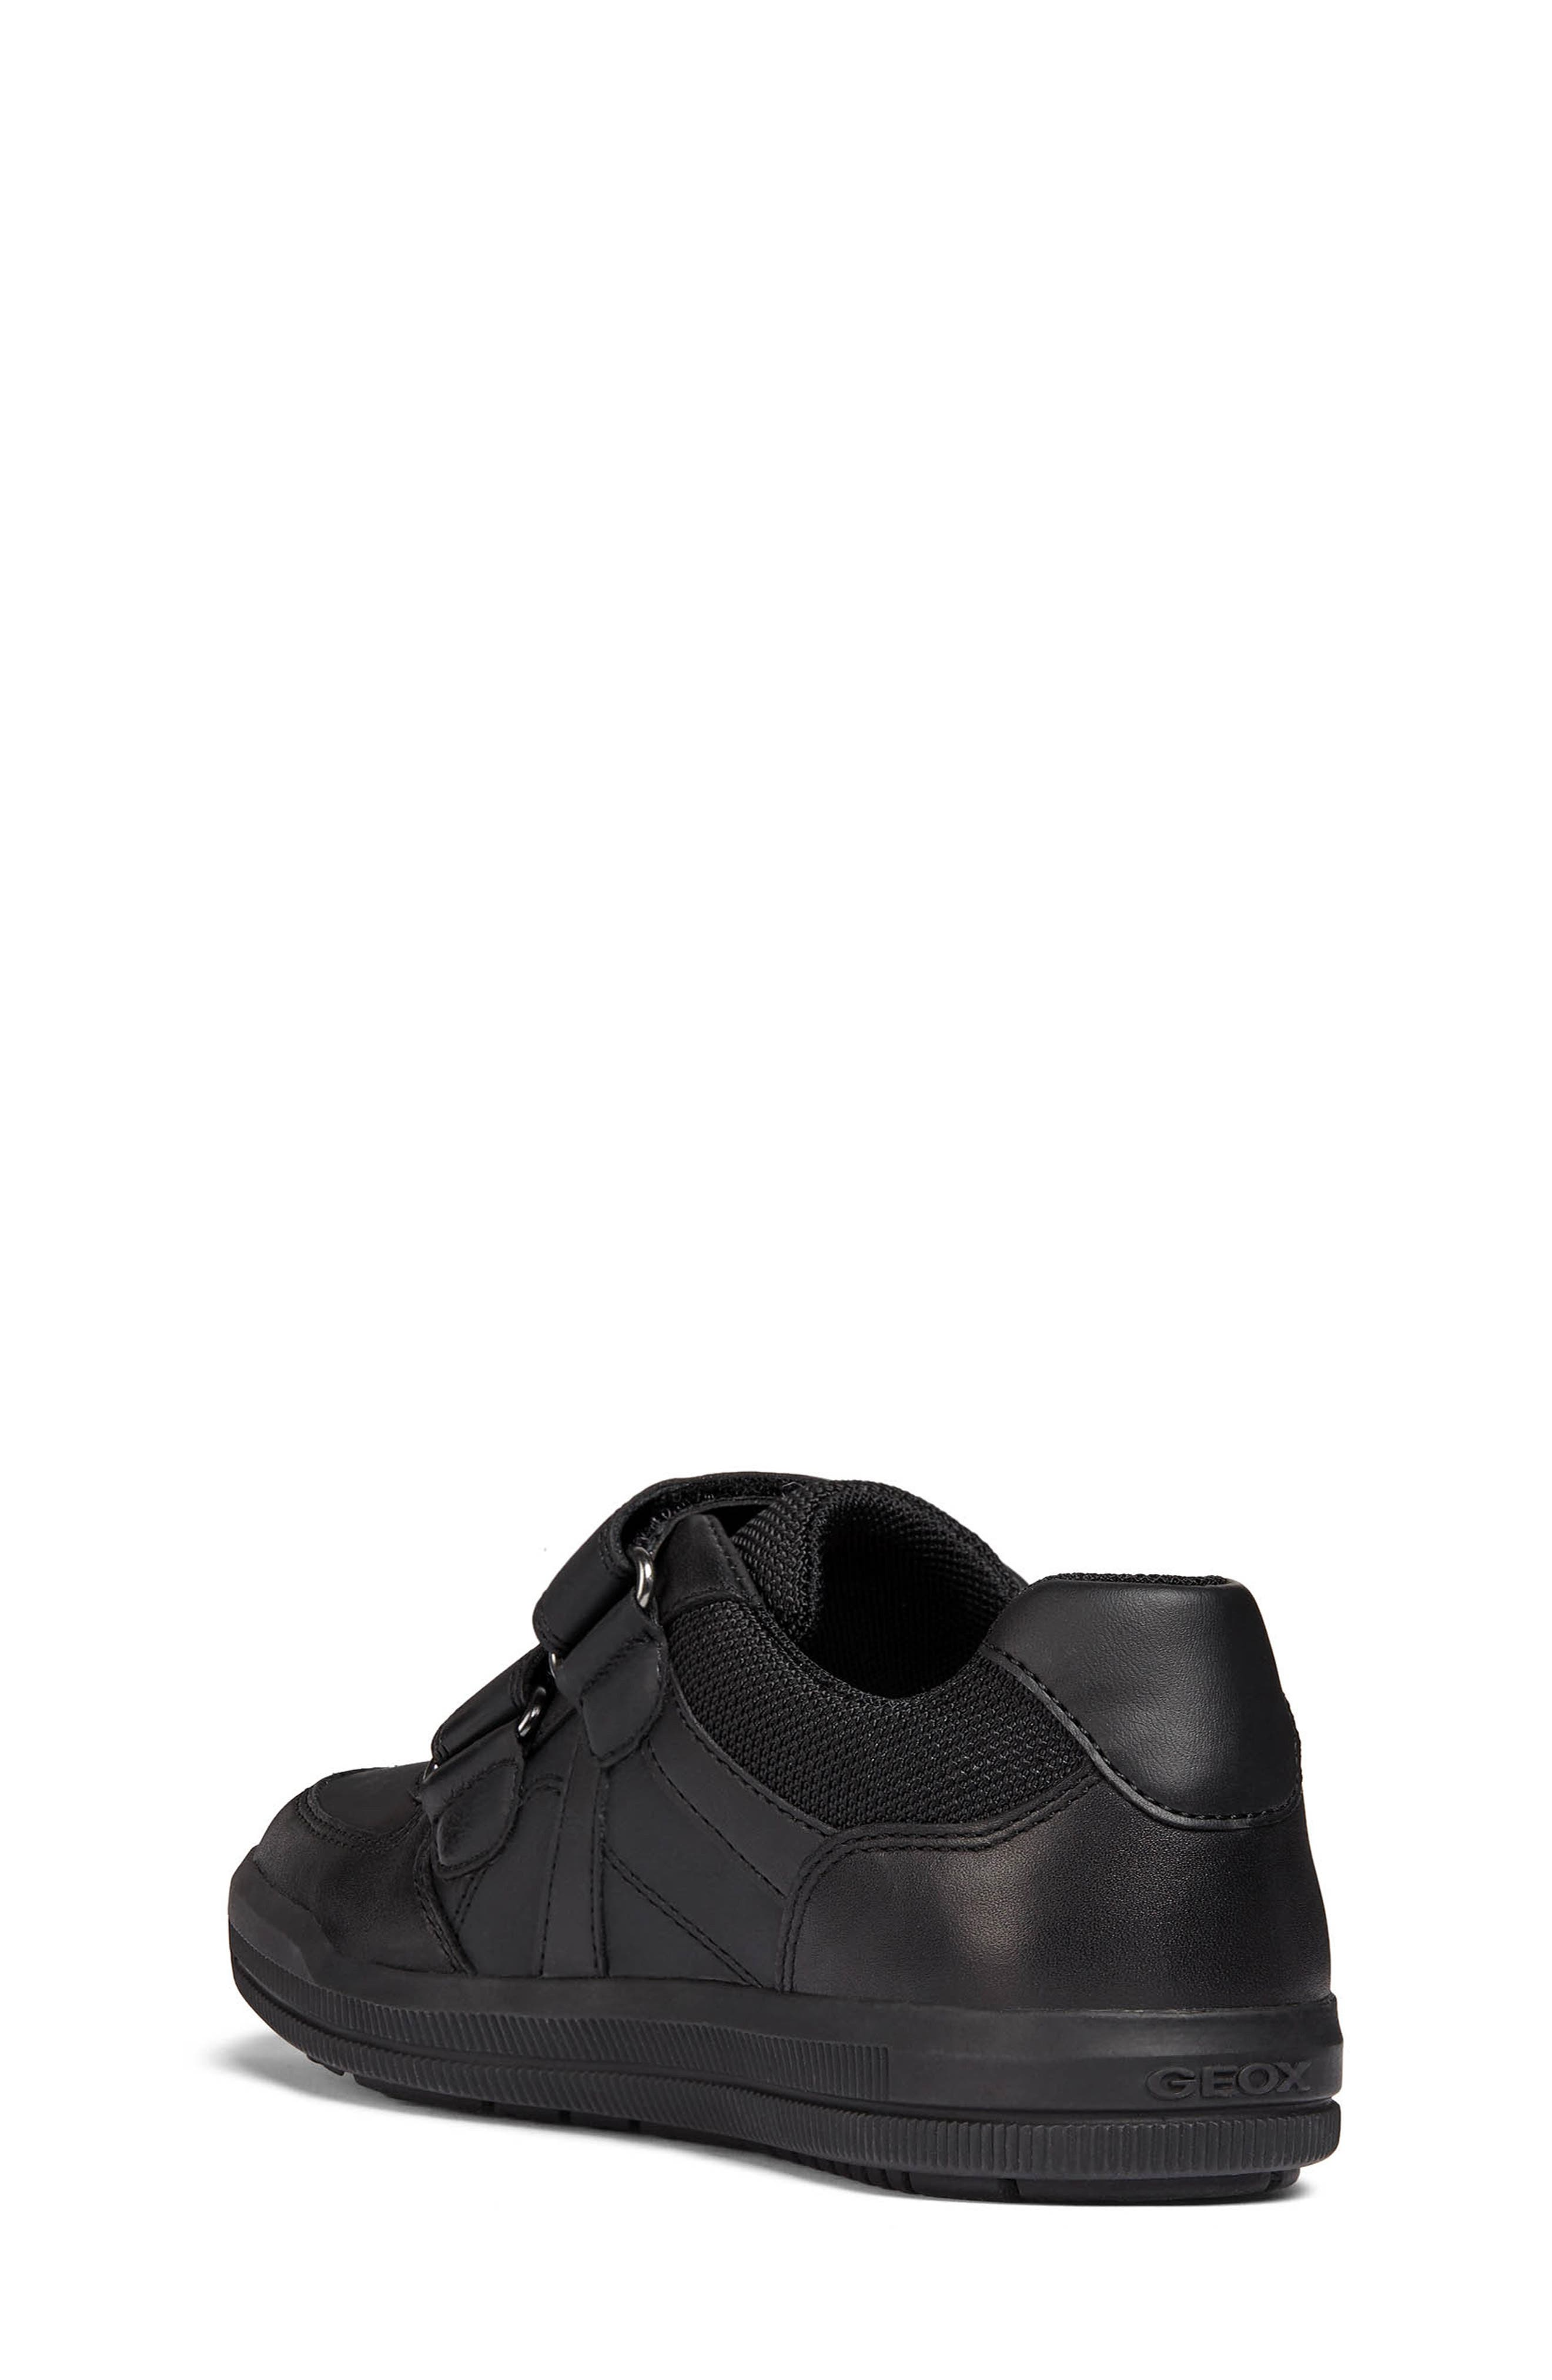 Arzach Sneaker,                             Alternate thumbnail 2, color,                             BLACK